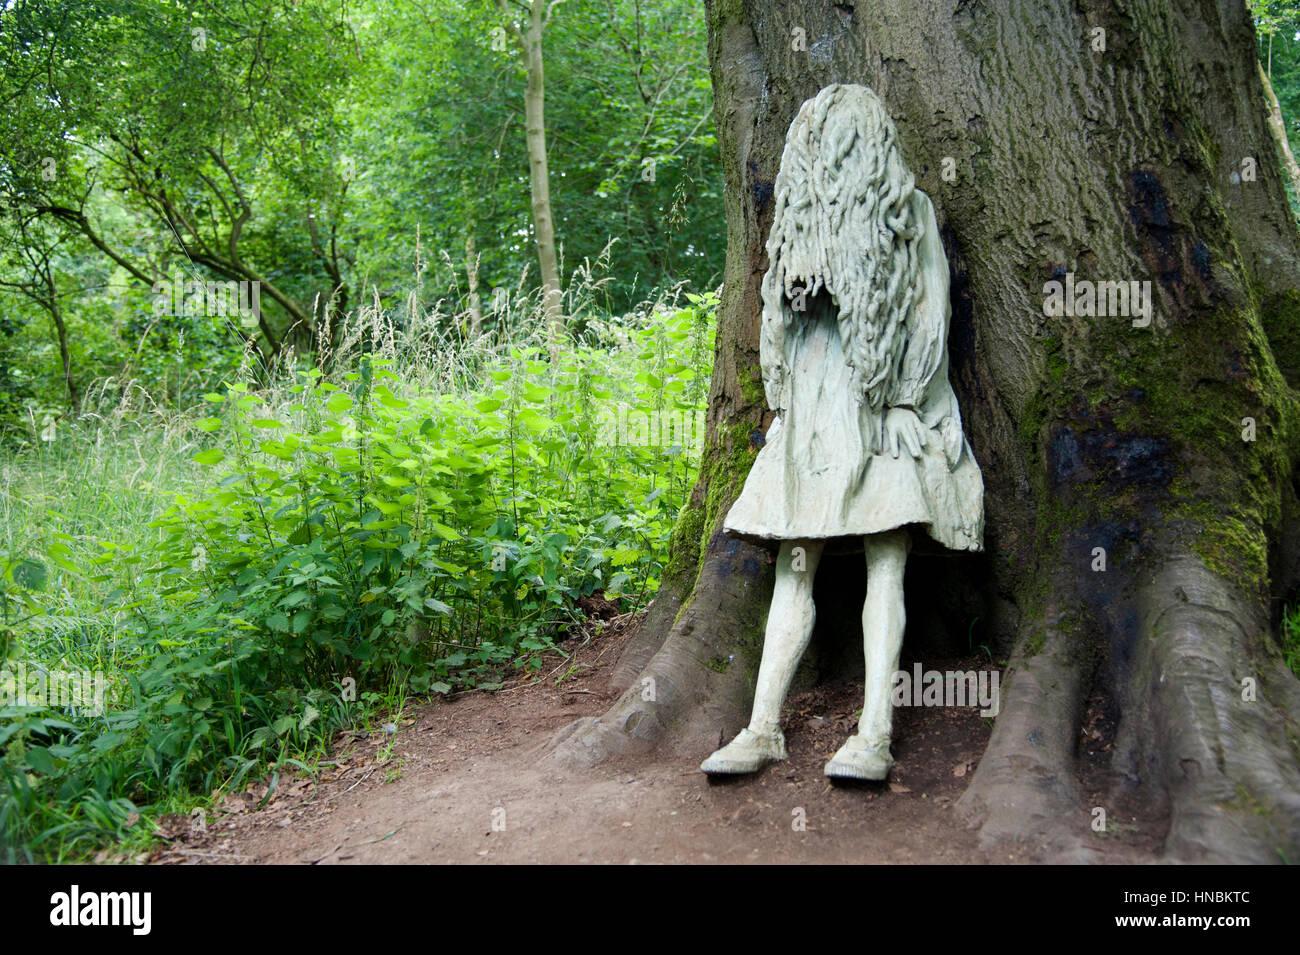 Niña llorando estatua de Jupiter Artland, Edimburgo. Imagen De Stock